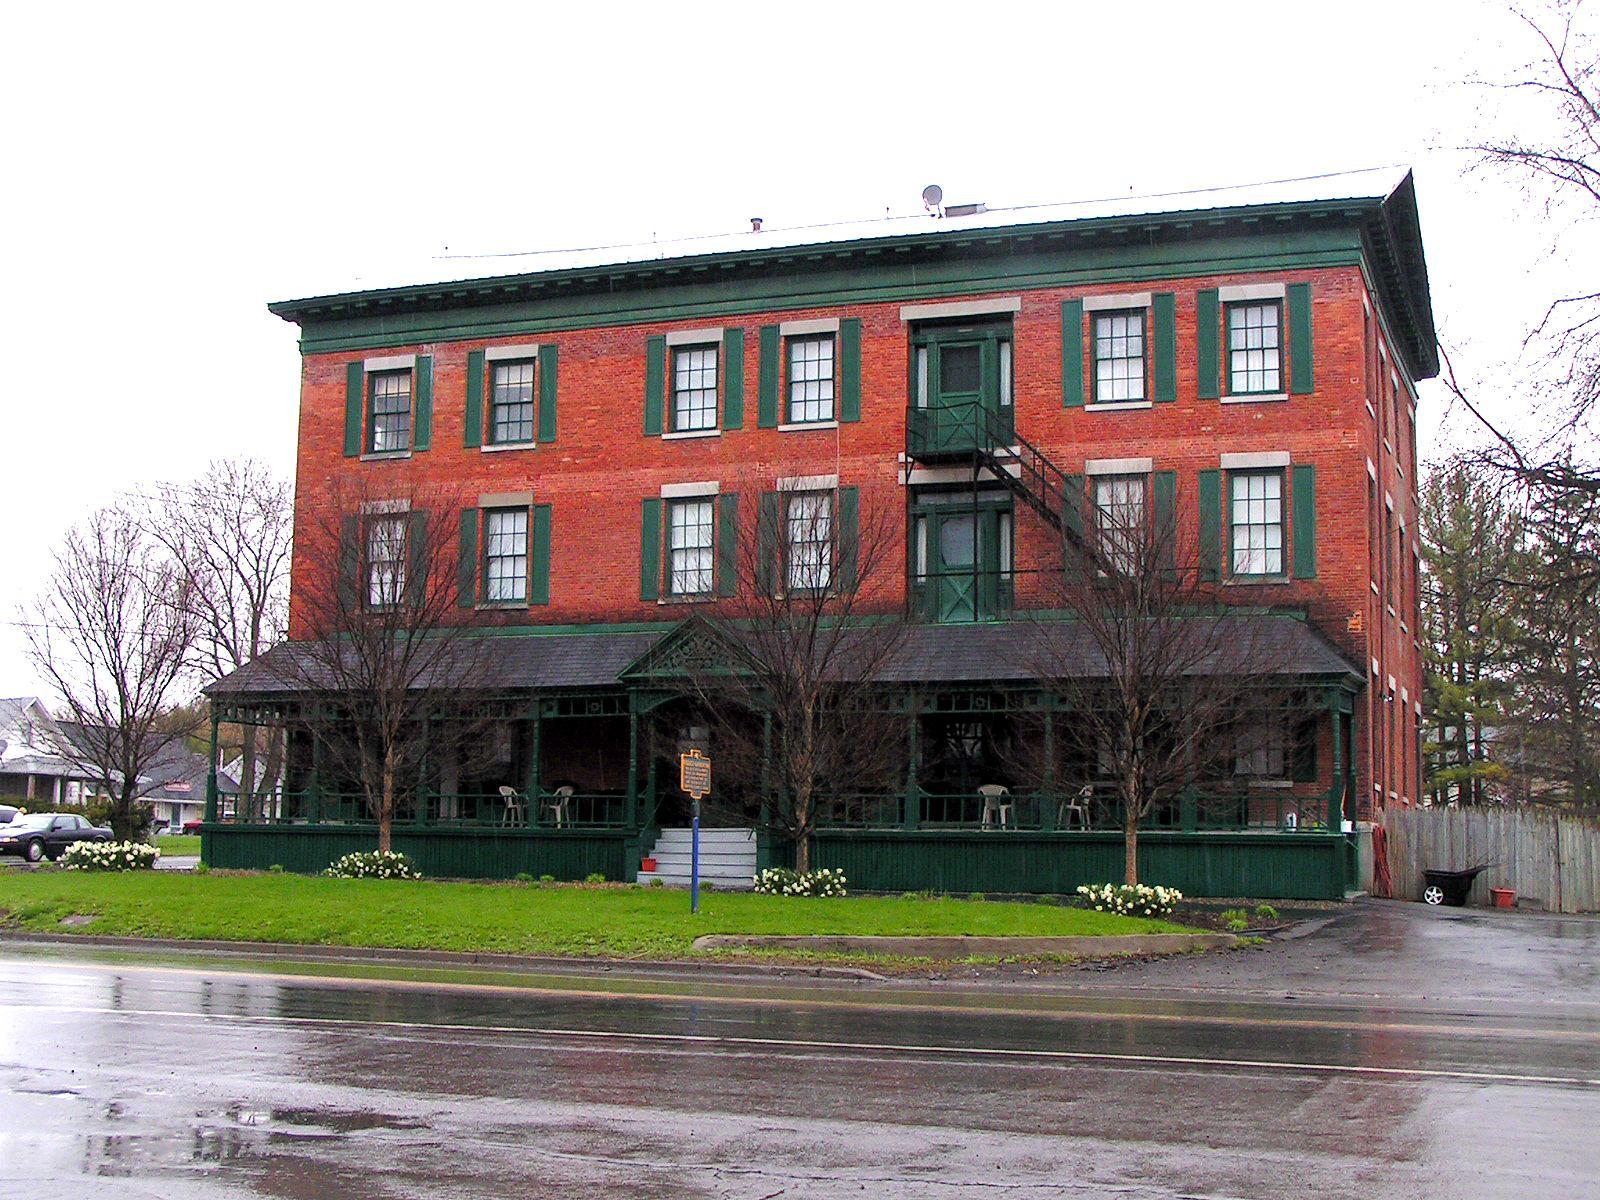 Rogues Harbor Inn was built between 1830-1842.